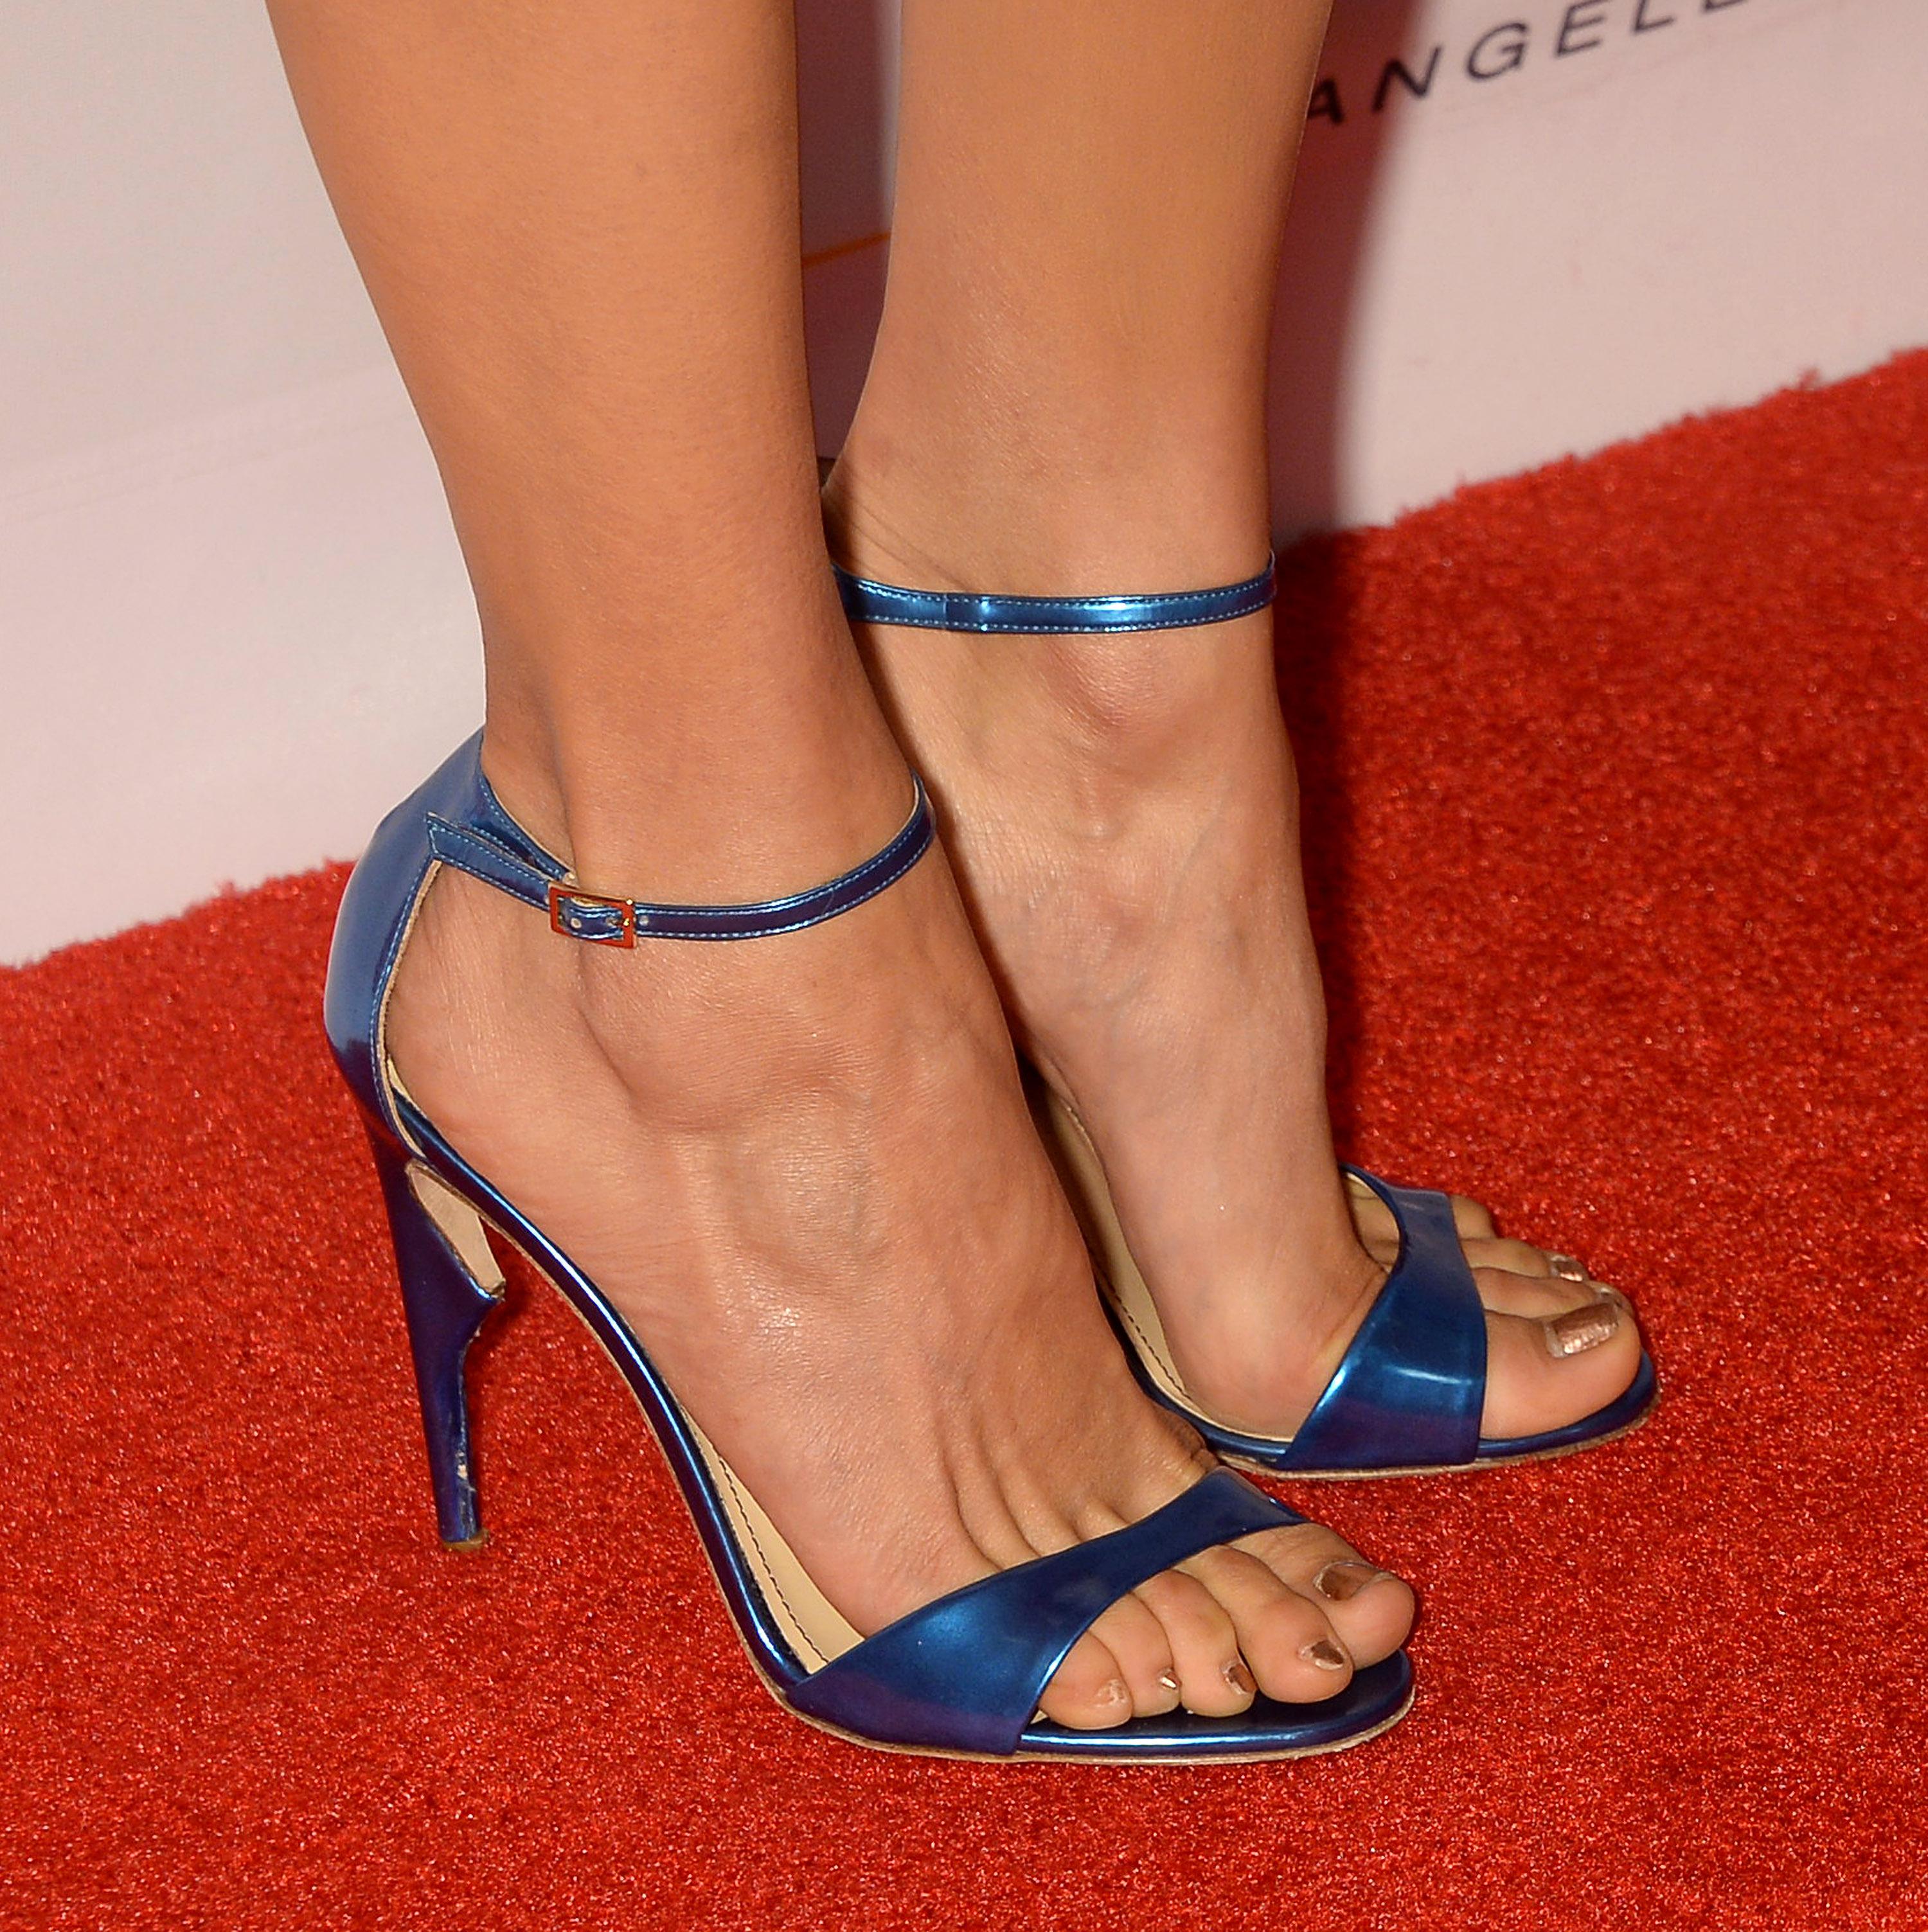 nina elle pornstar feet toes